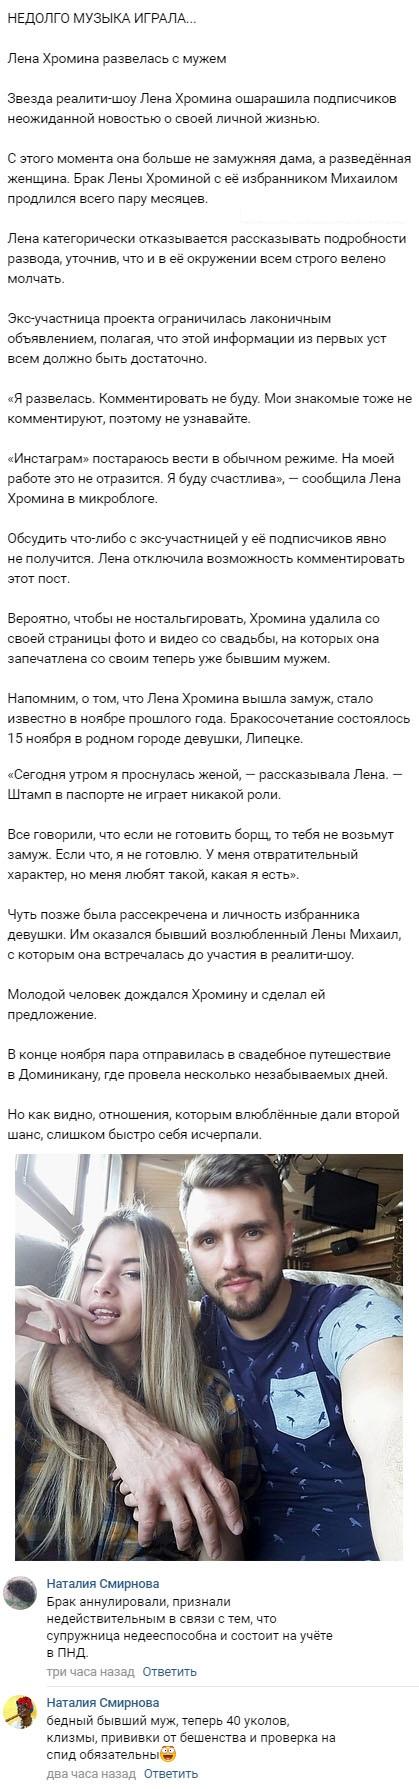 Елена Хромина развелась после нескольких месяцев брака